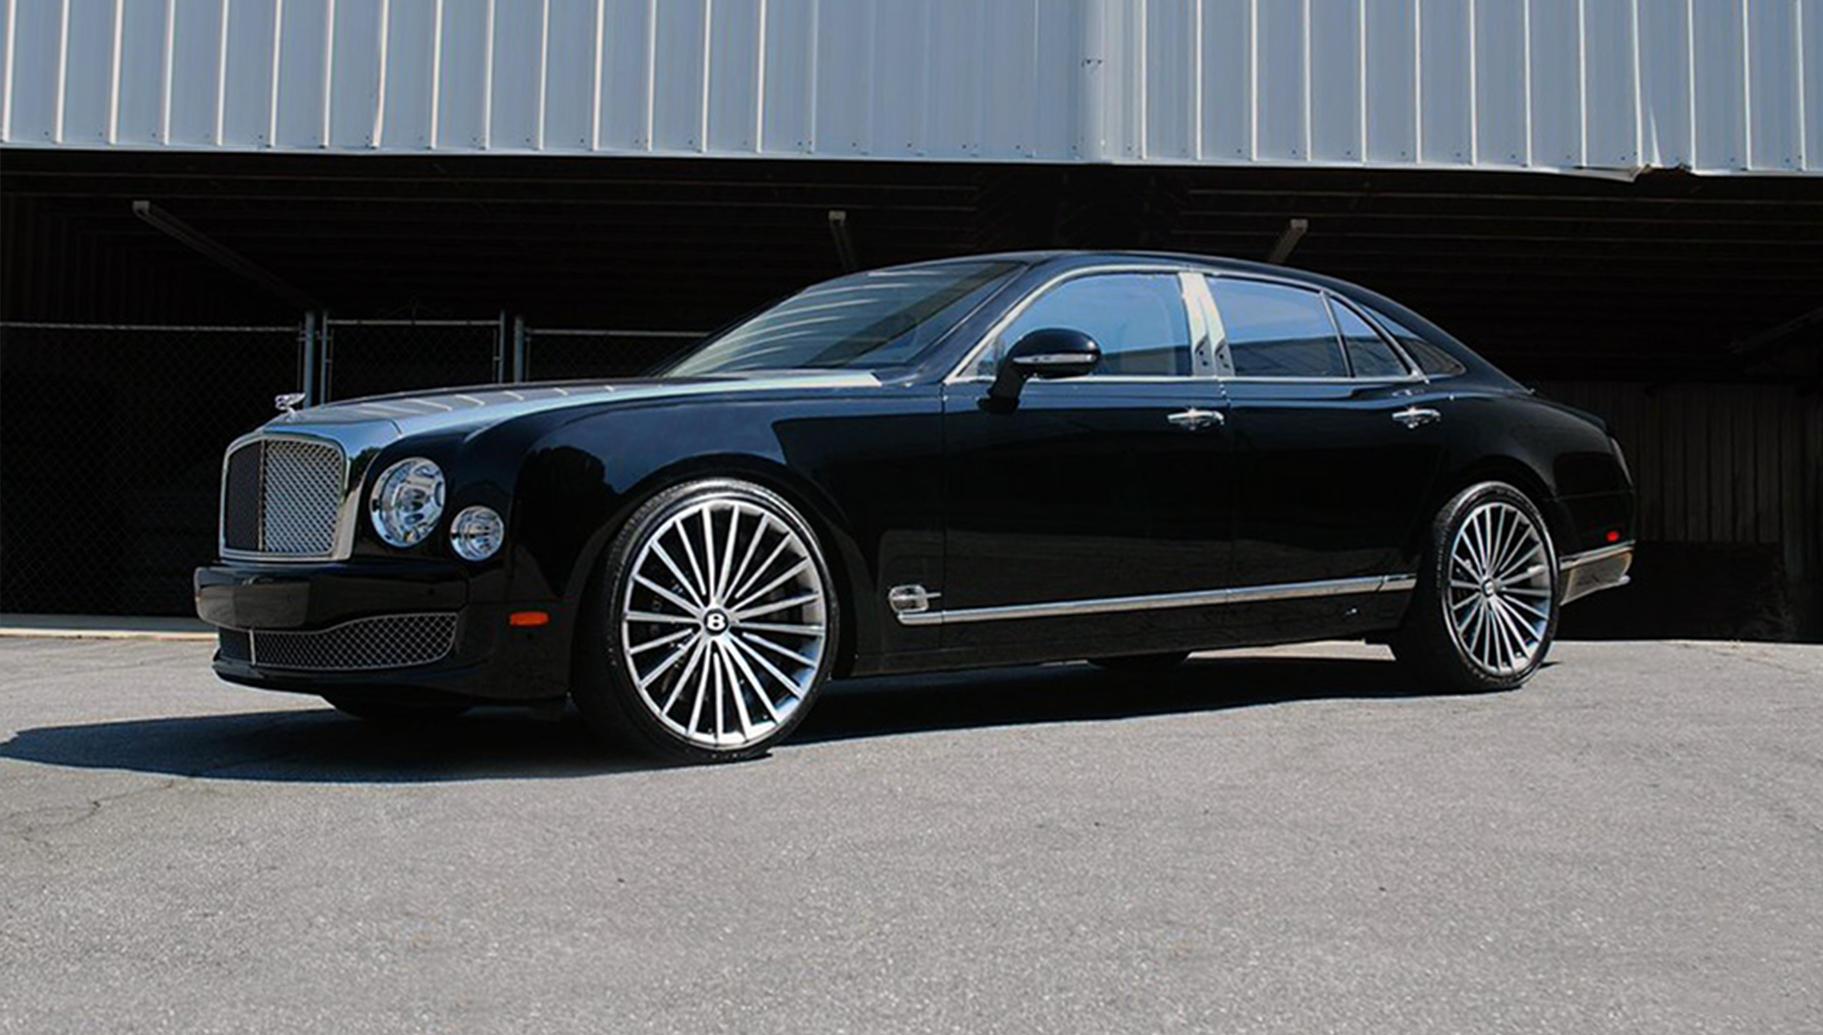 2014 bentley mulsanne partsopen. Cars Review. Best American Auto & Cars Review